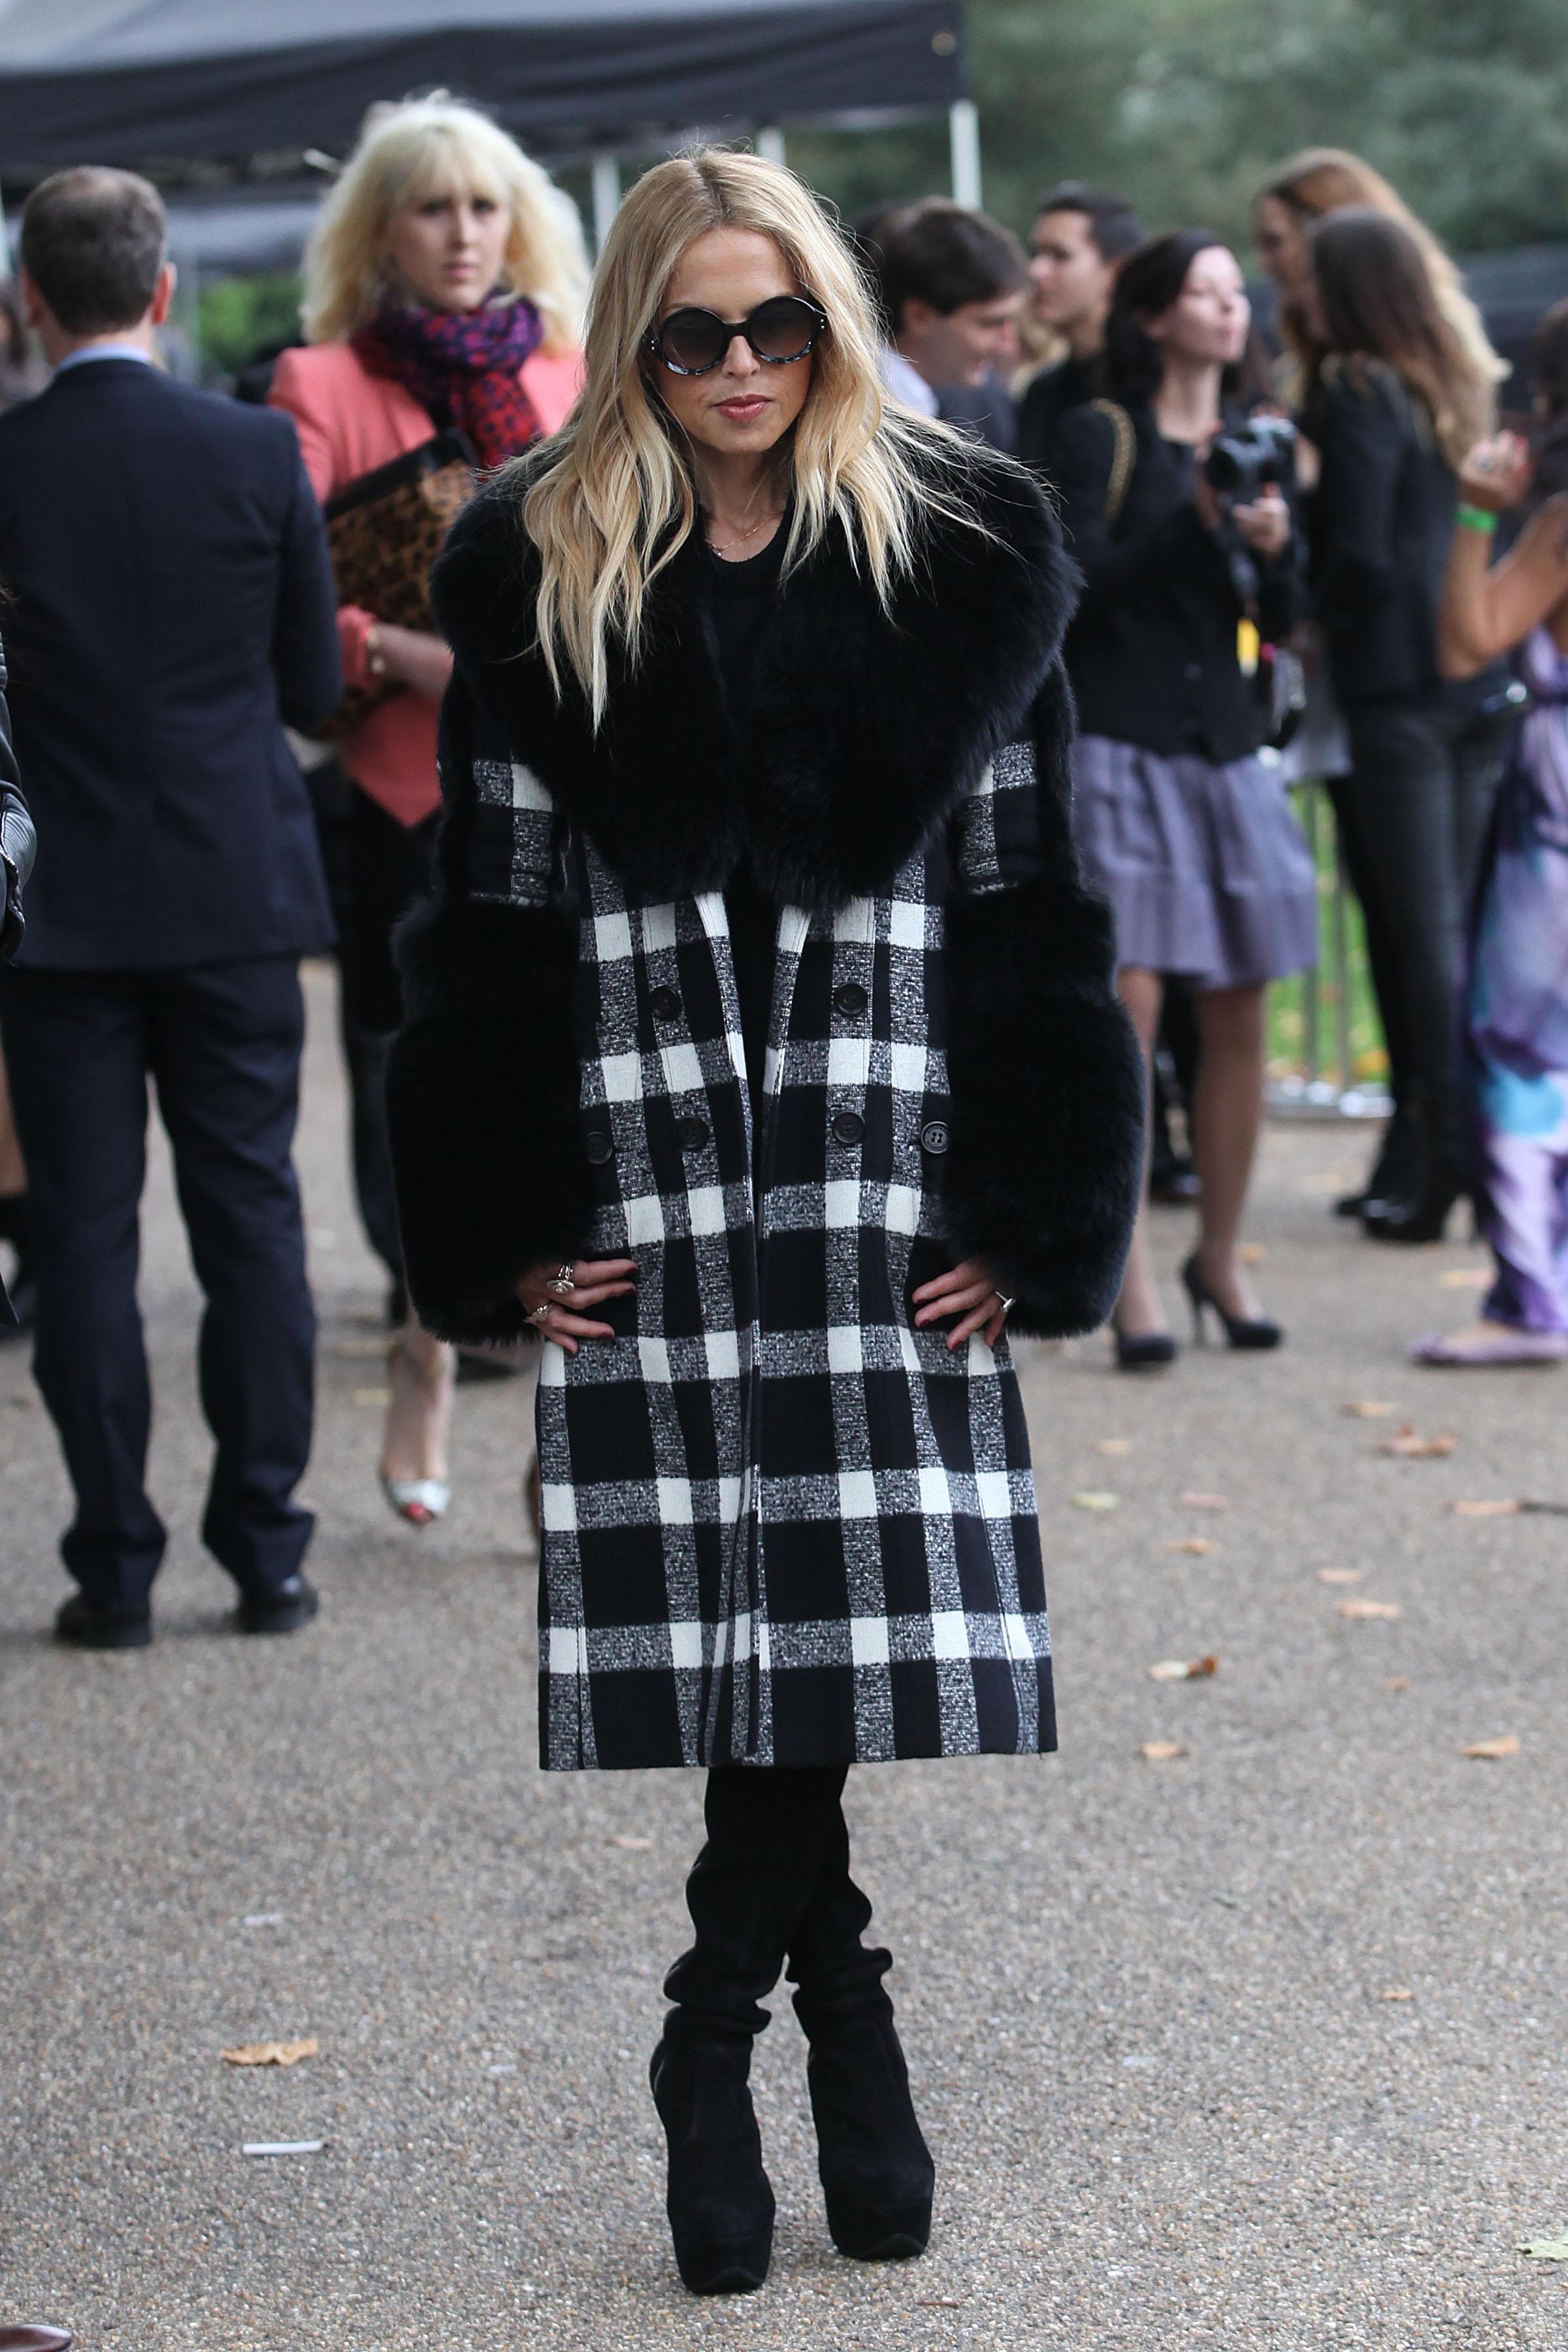 London Fashion Week S/S 2012 - Celebrity Sightings